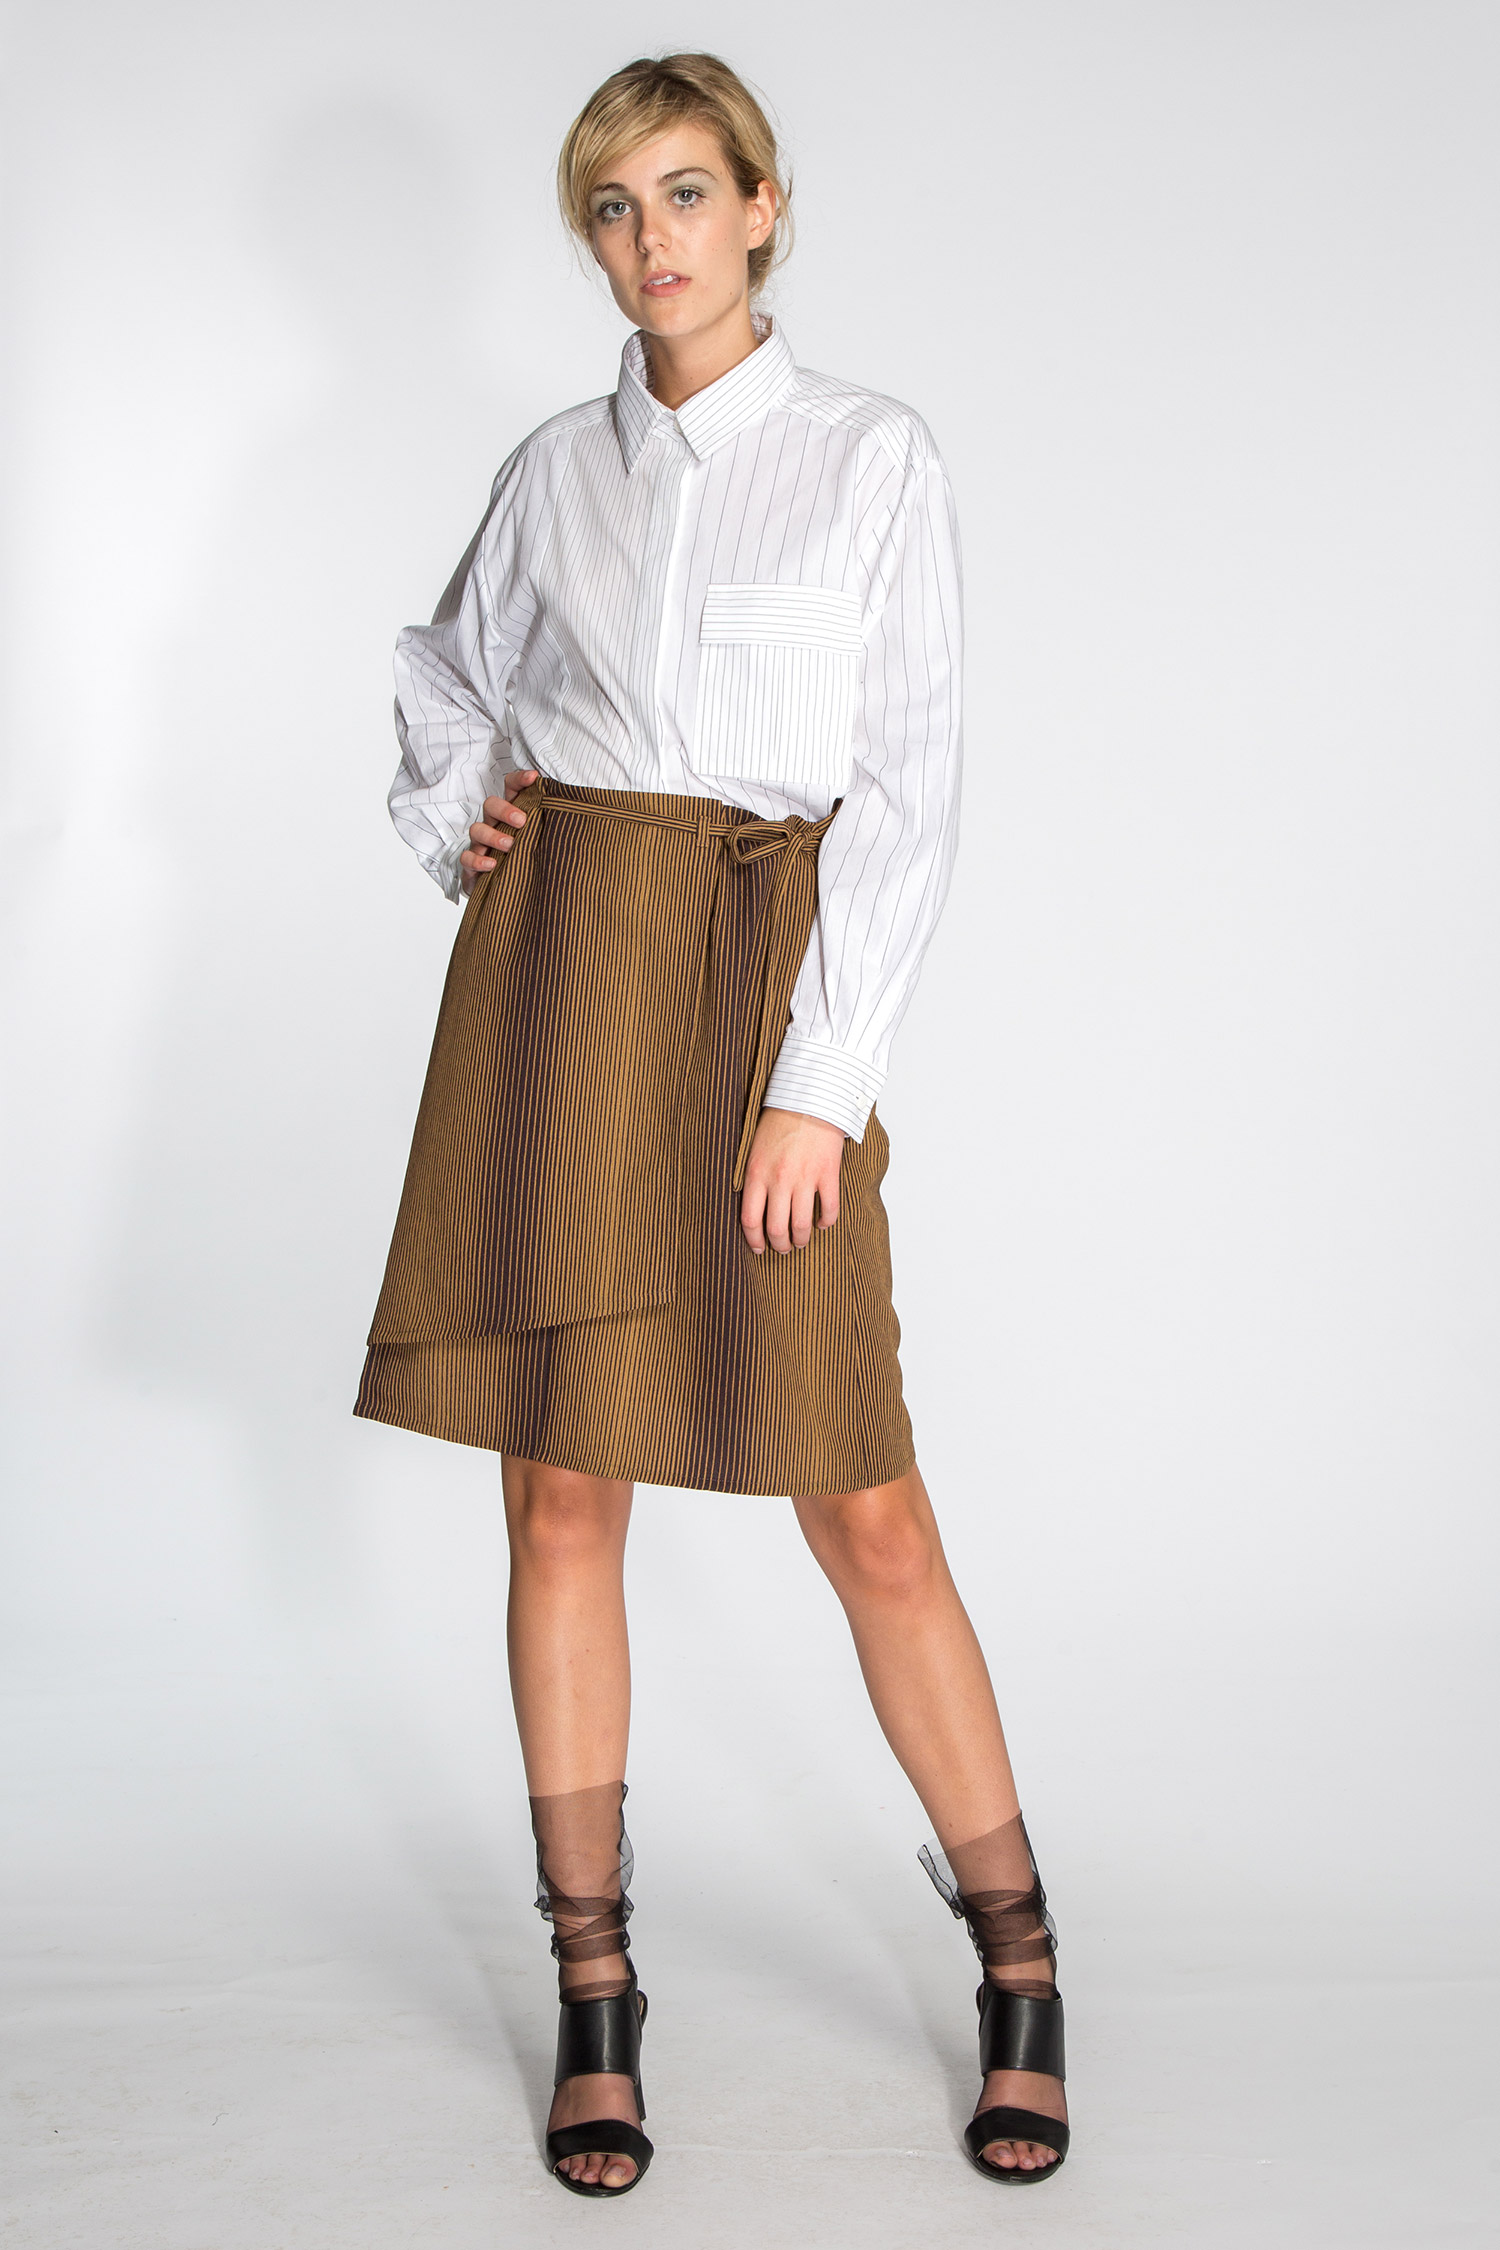 18.8.31-Asiatica-Clothing-Shoot-Lillie-713.jpg